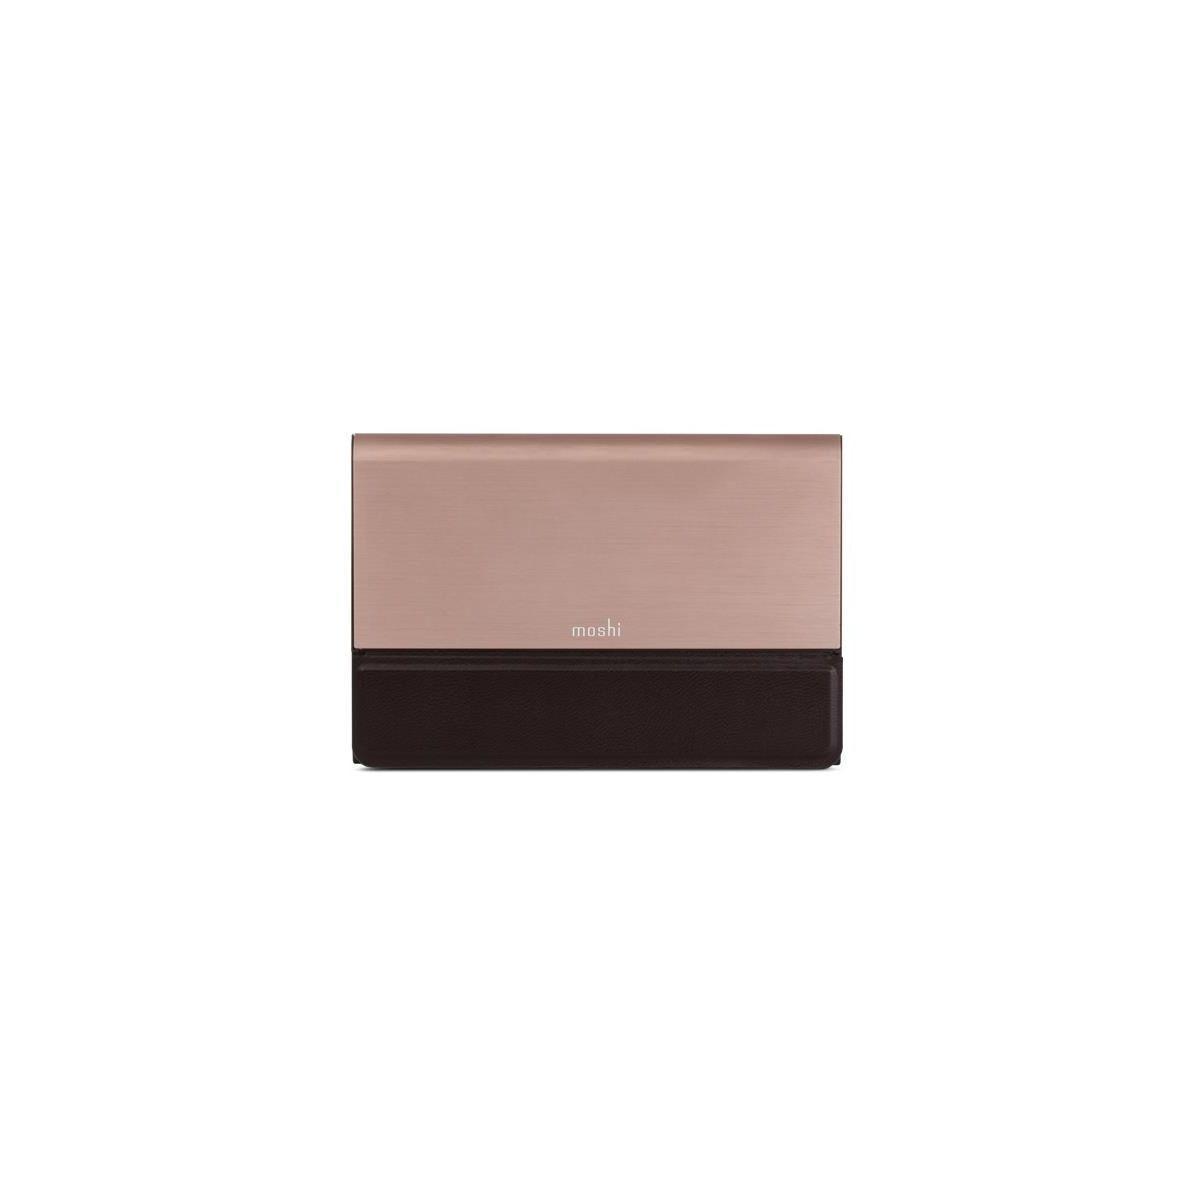 Batterie externe moshi 5150 mah bronze - usb+cable lighthning - livraison offerte : code premium (photo)